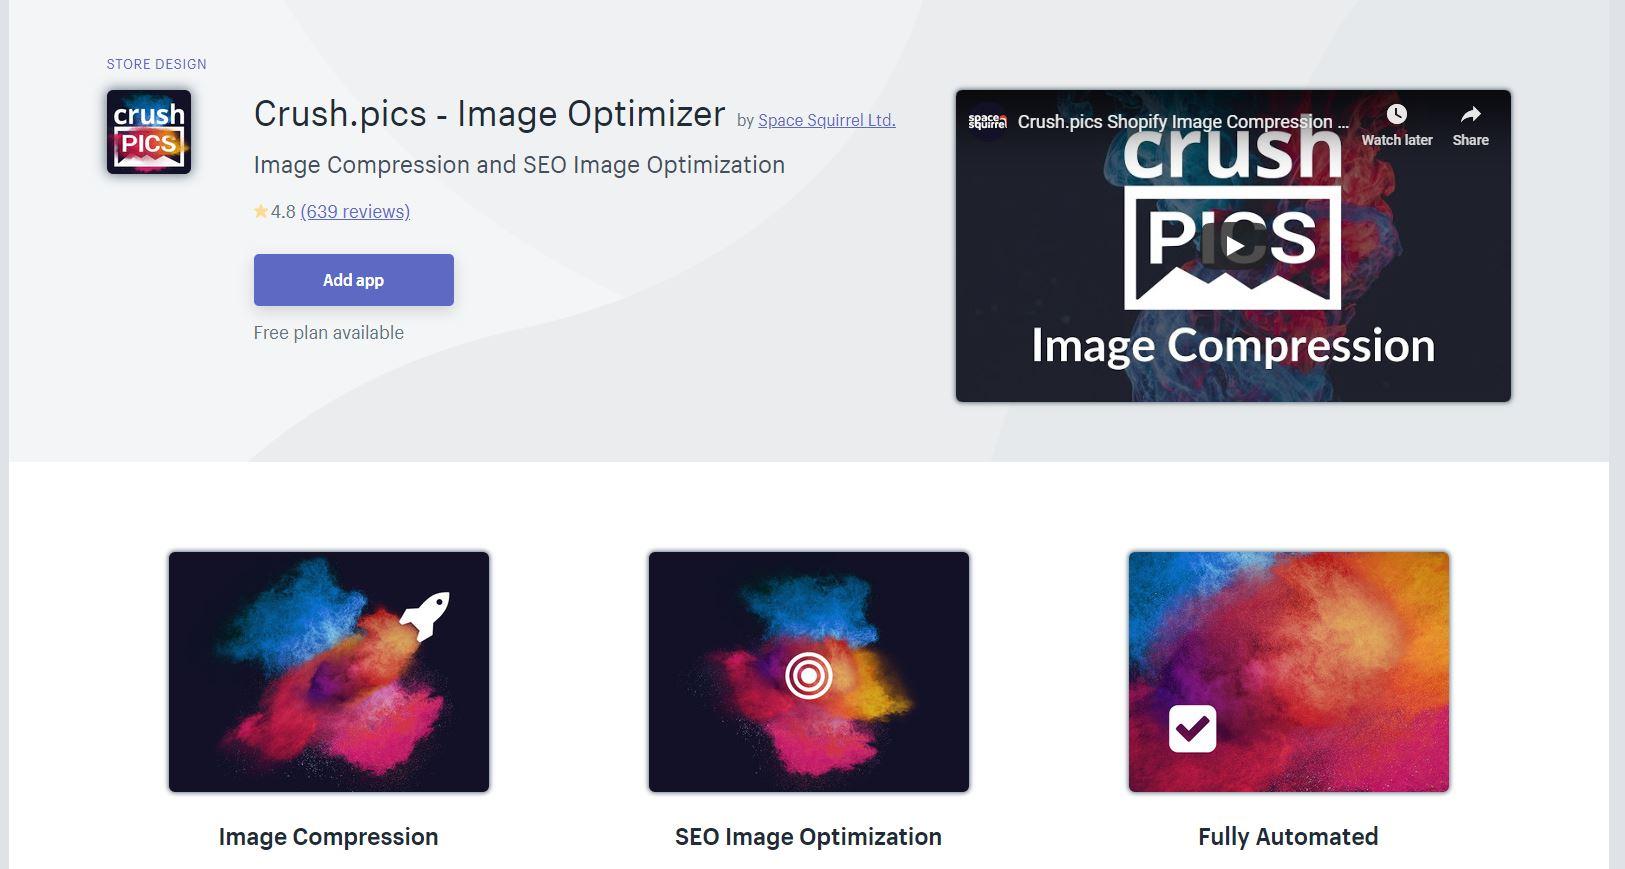 Crush Pics Shopify App